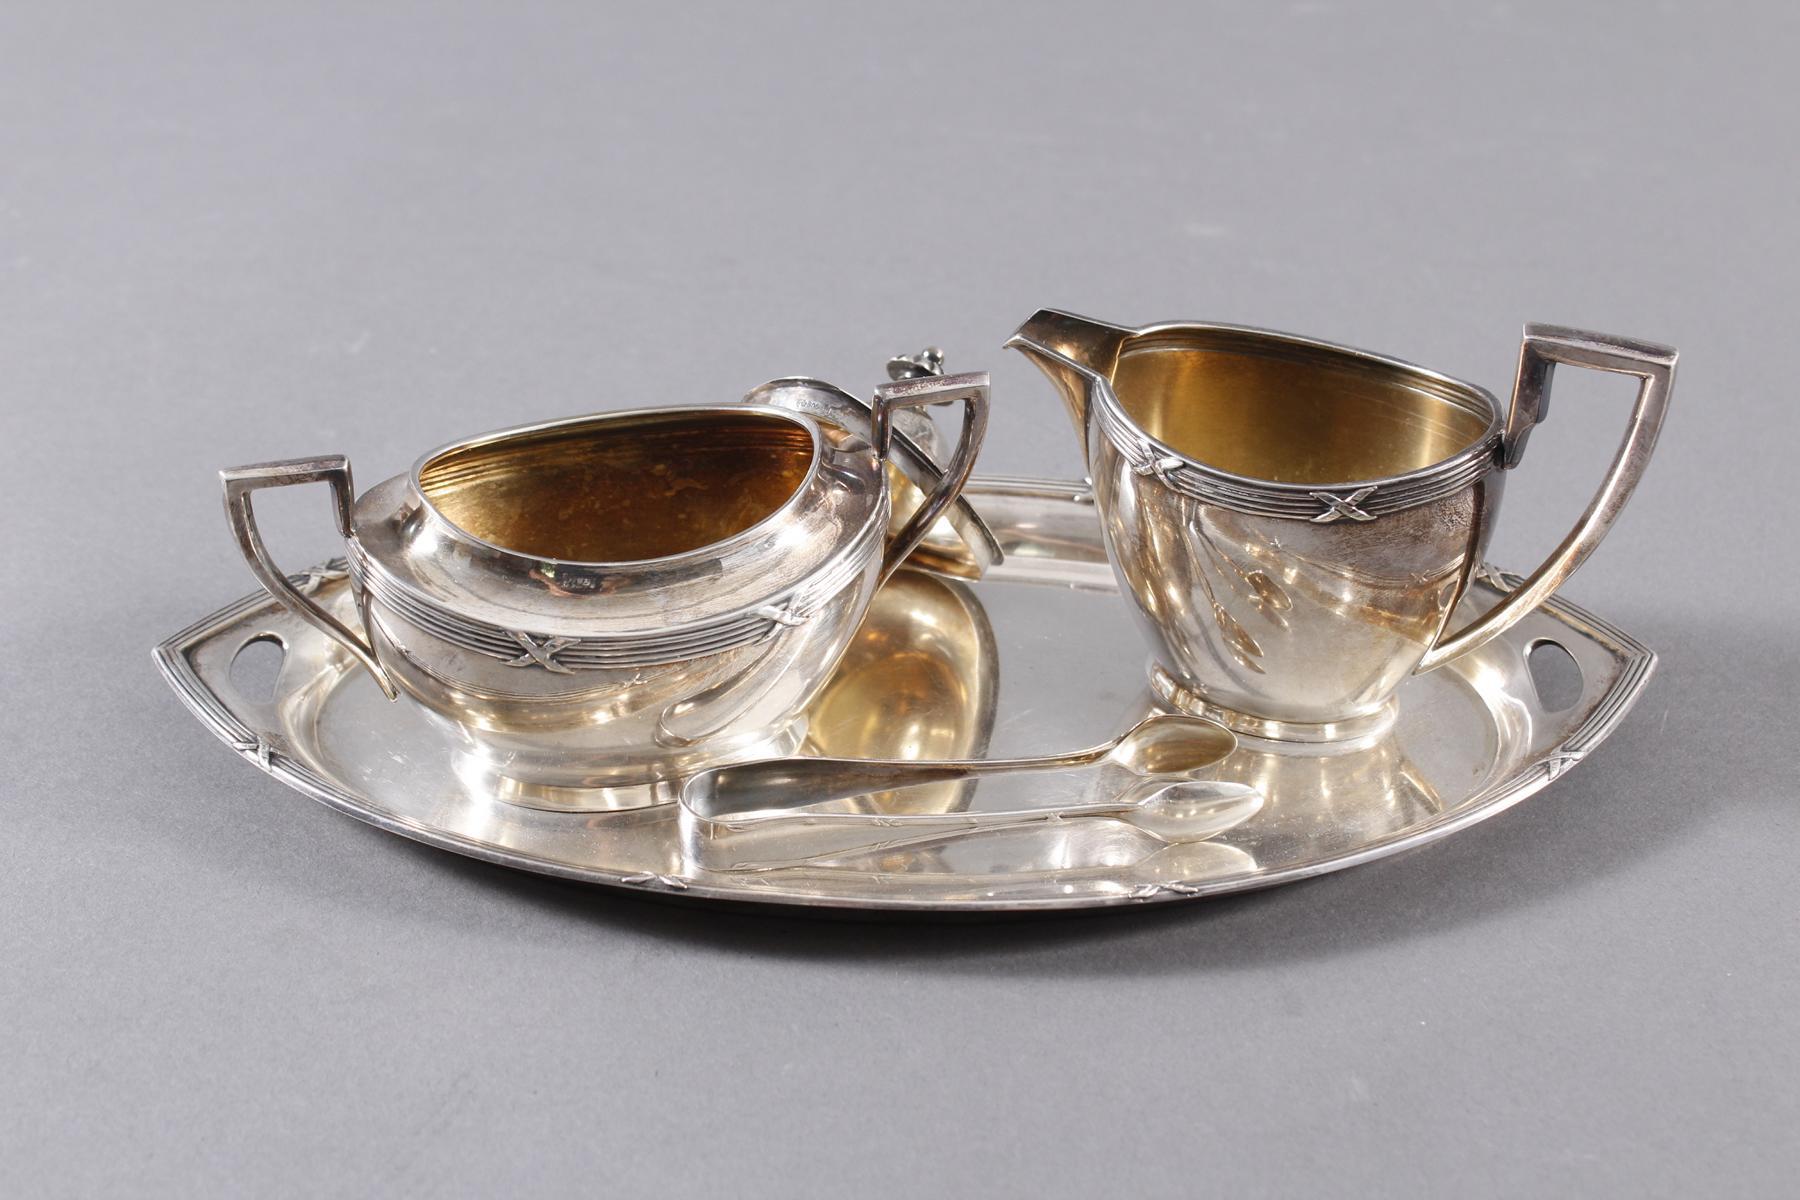 Silberset, 4-teilig, Wilhelm Binder Silber 800-2